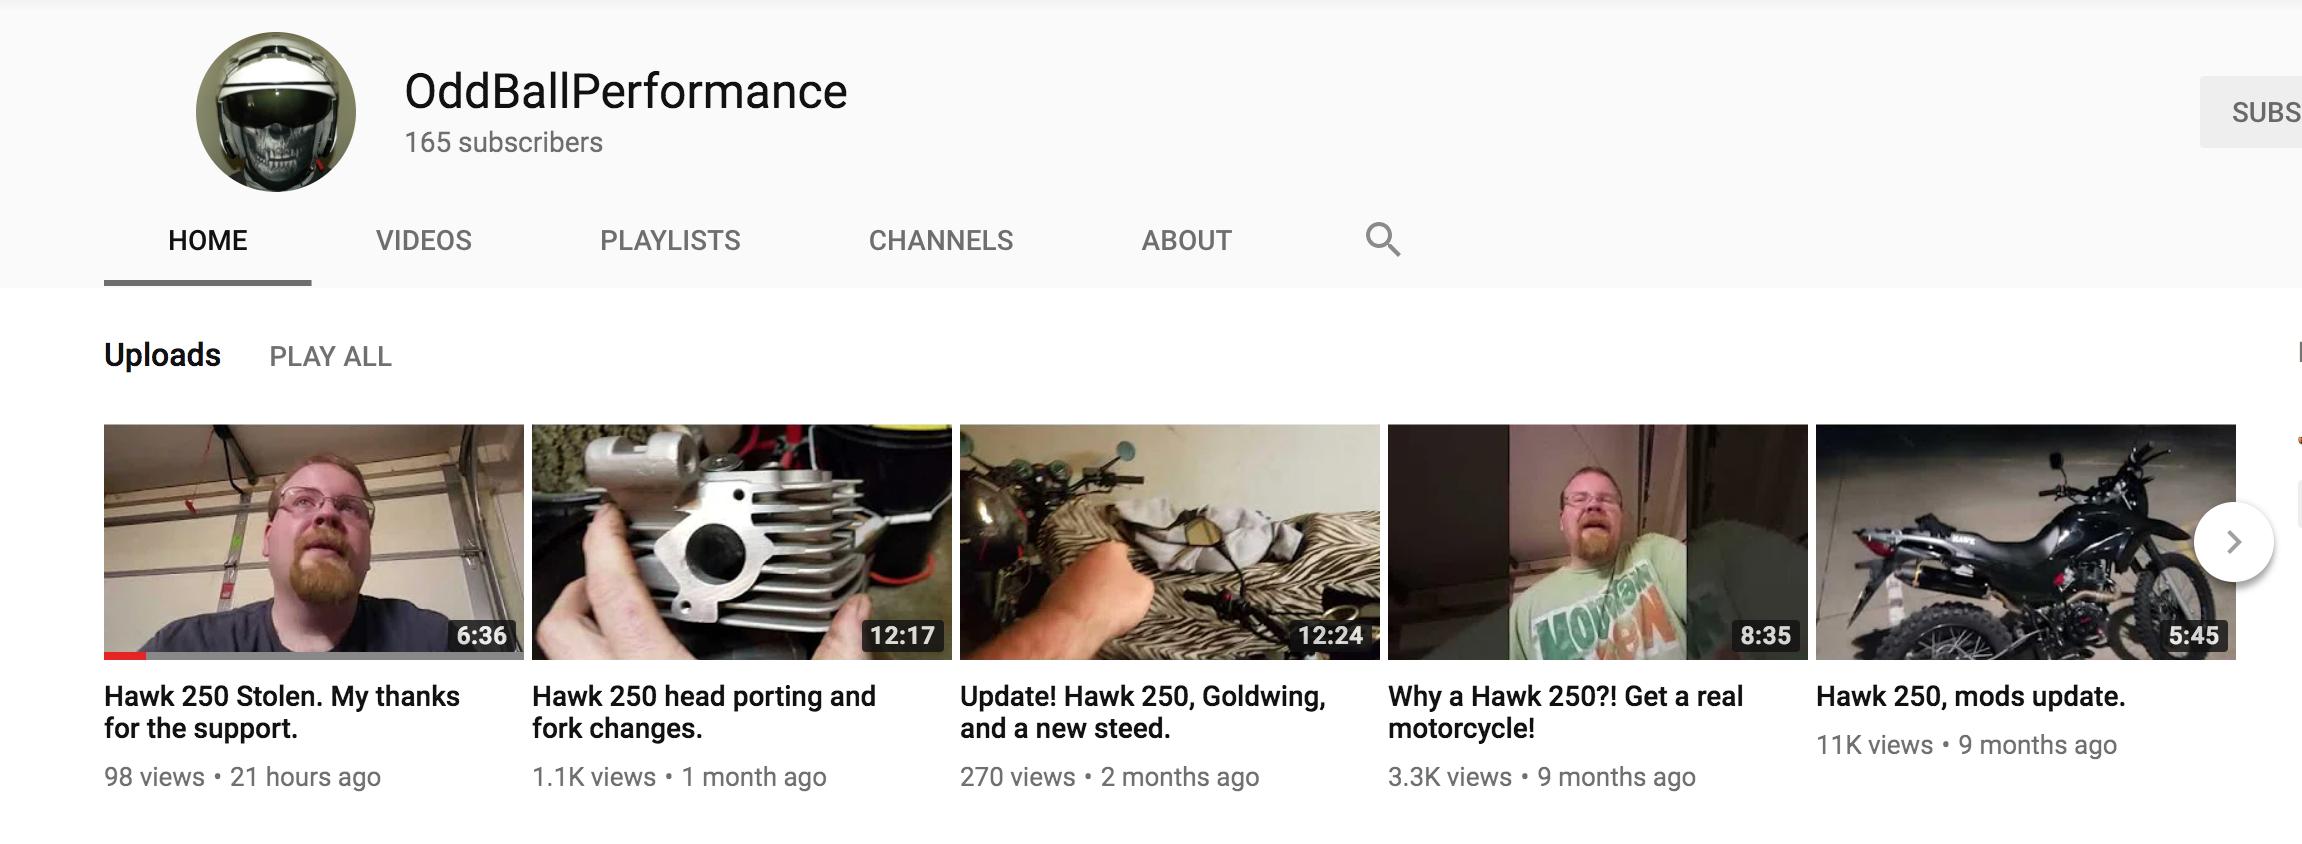 YouTuber OddBallPerformance's Hawk 250 Stolen - Lets Help Him Get Back On a Hawk